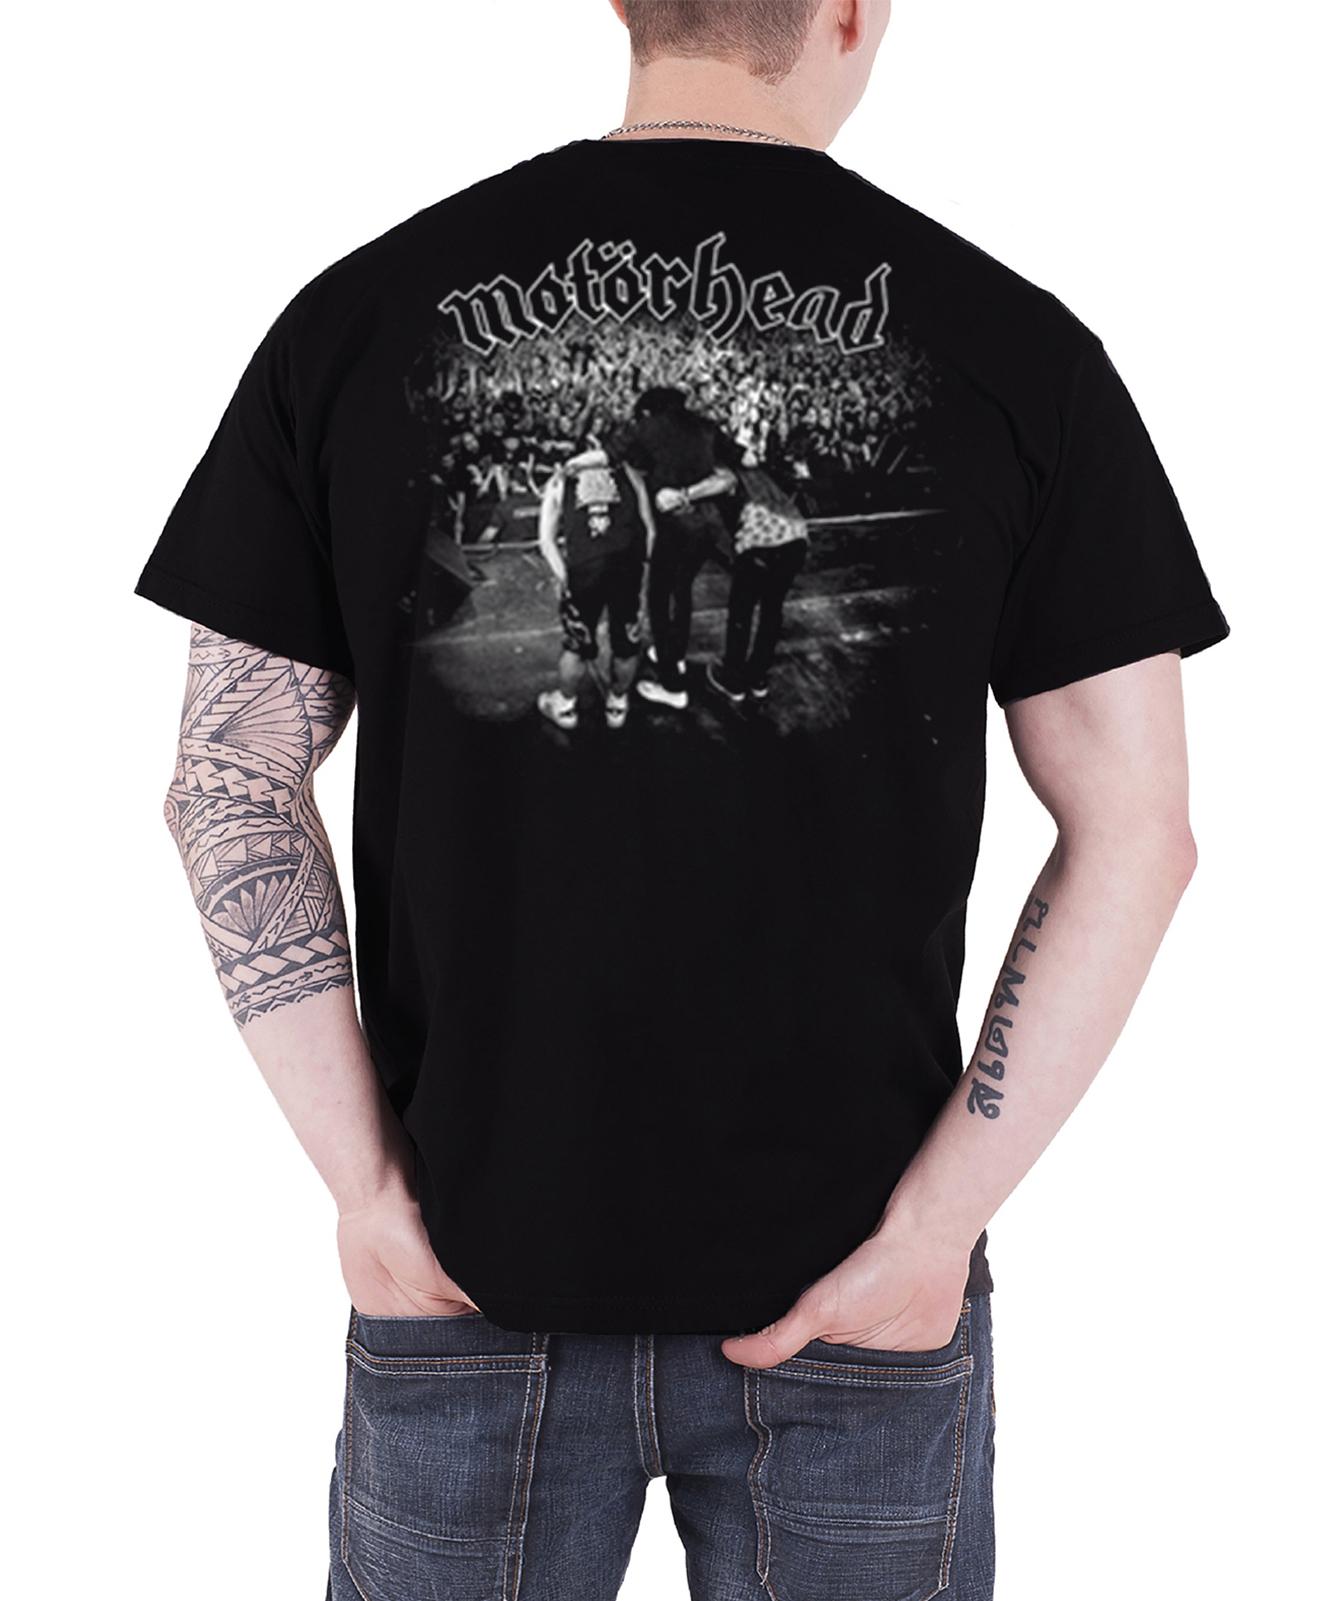 Motorhead-T-Shirt-Lemmy-RIP-England-warpig-clean-your-clock-official-new-mens Indexbild 15